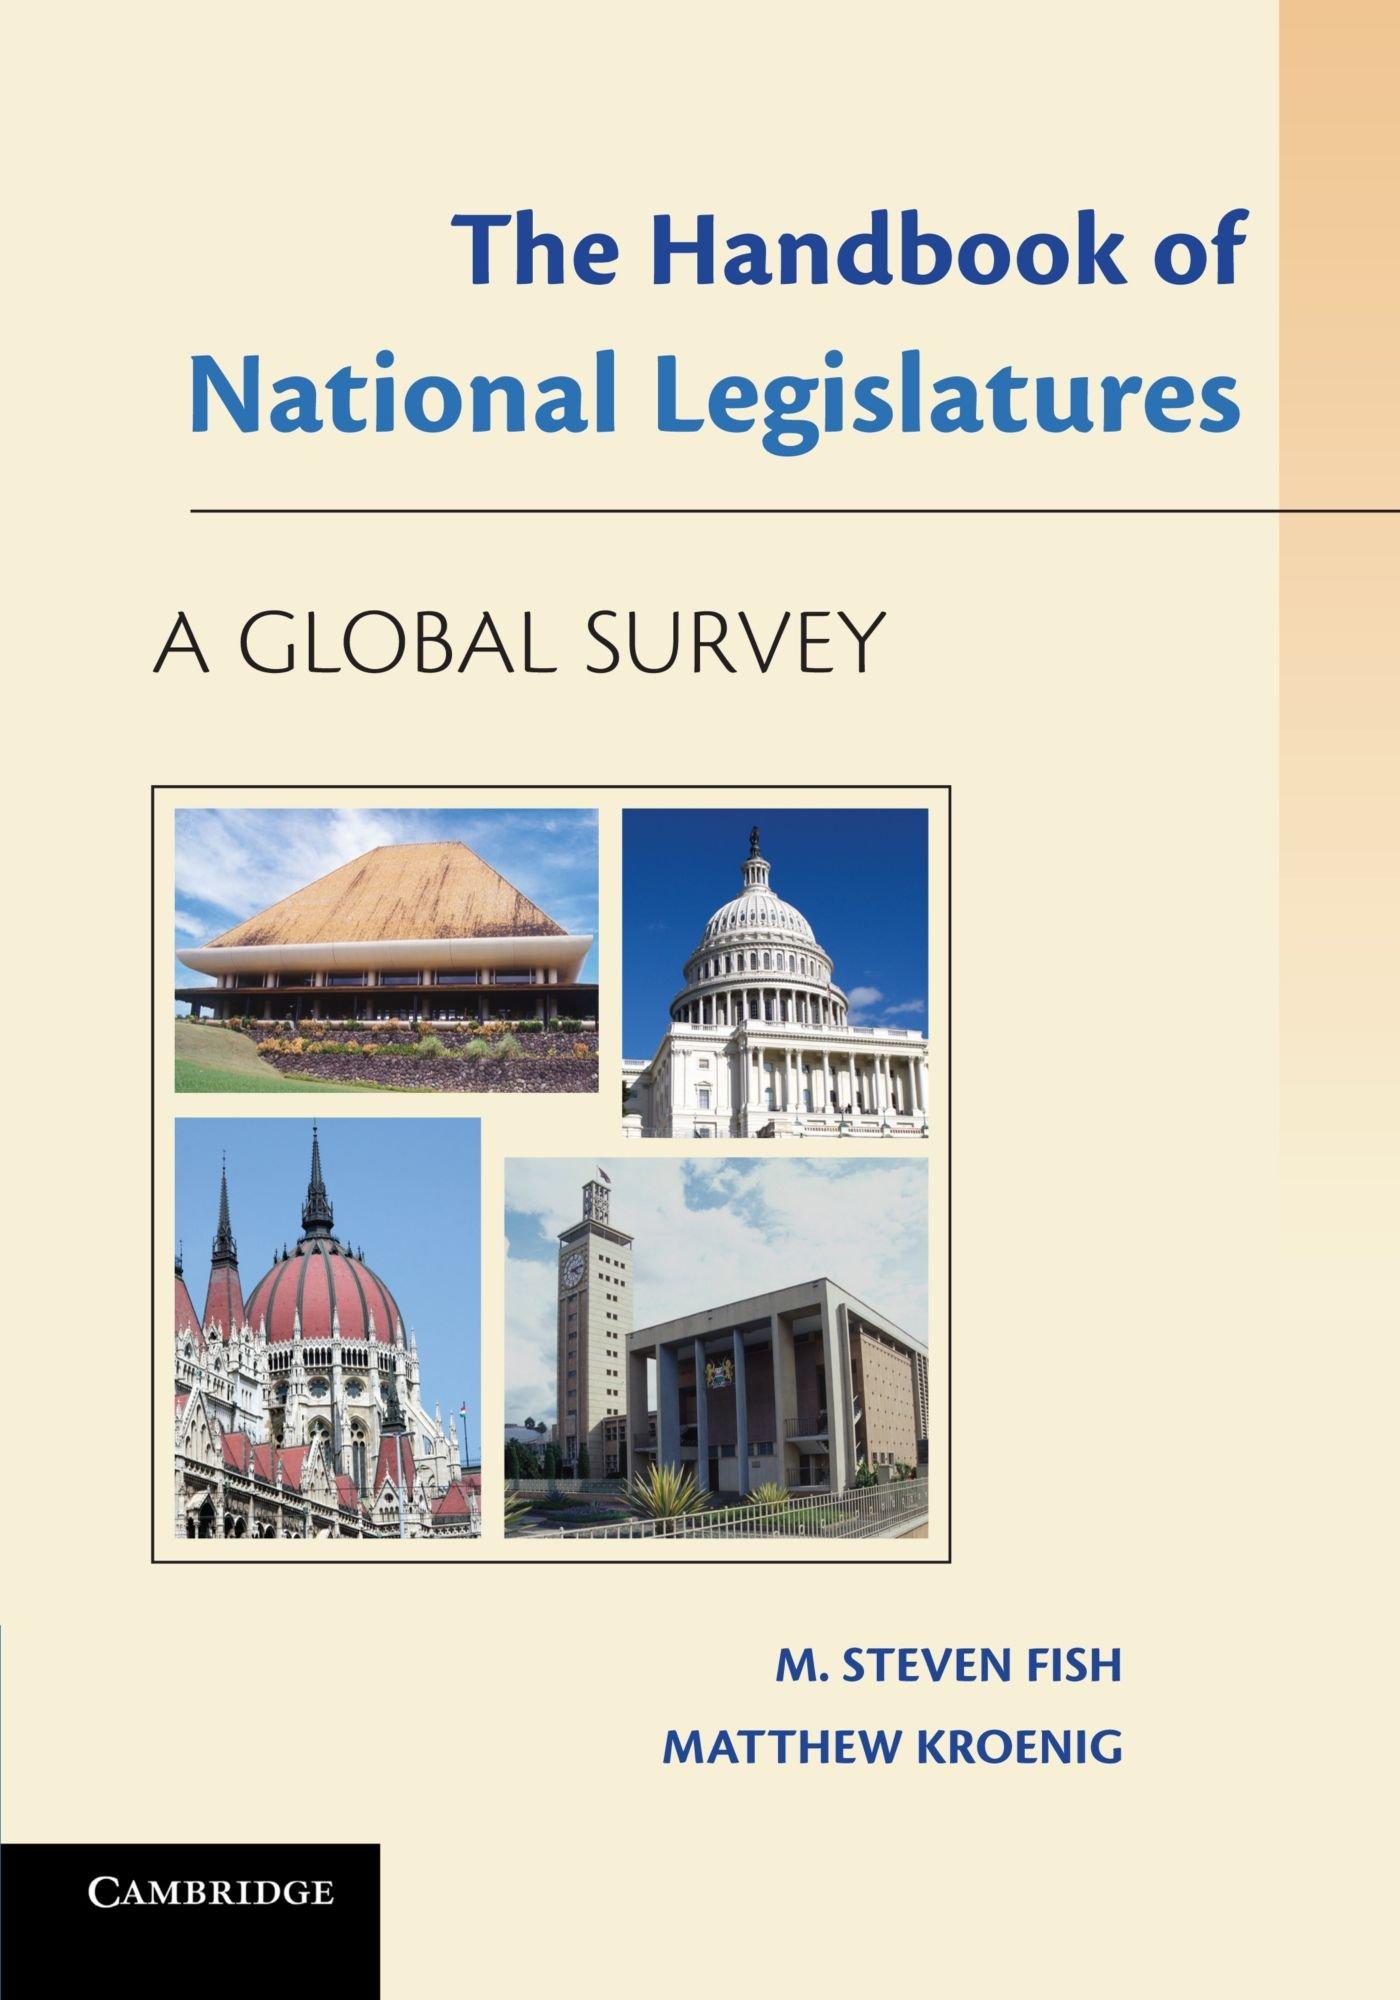 The Handbook of National Legislatures: A Global Survey pdf